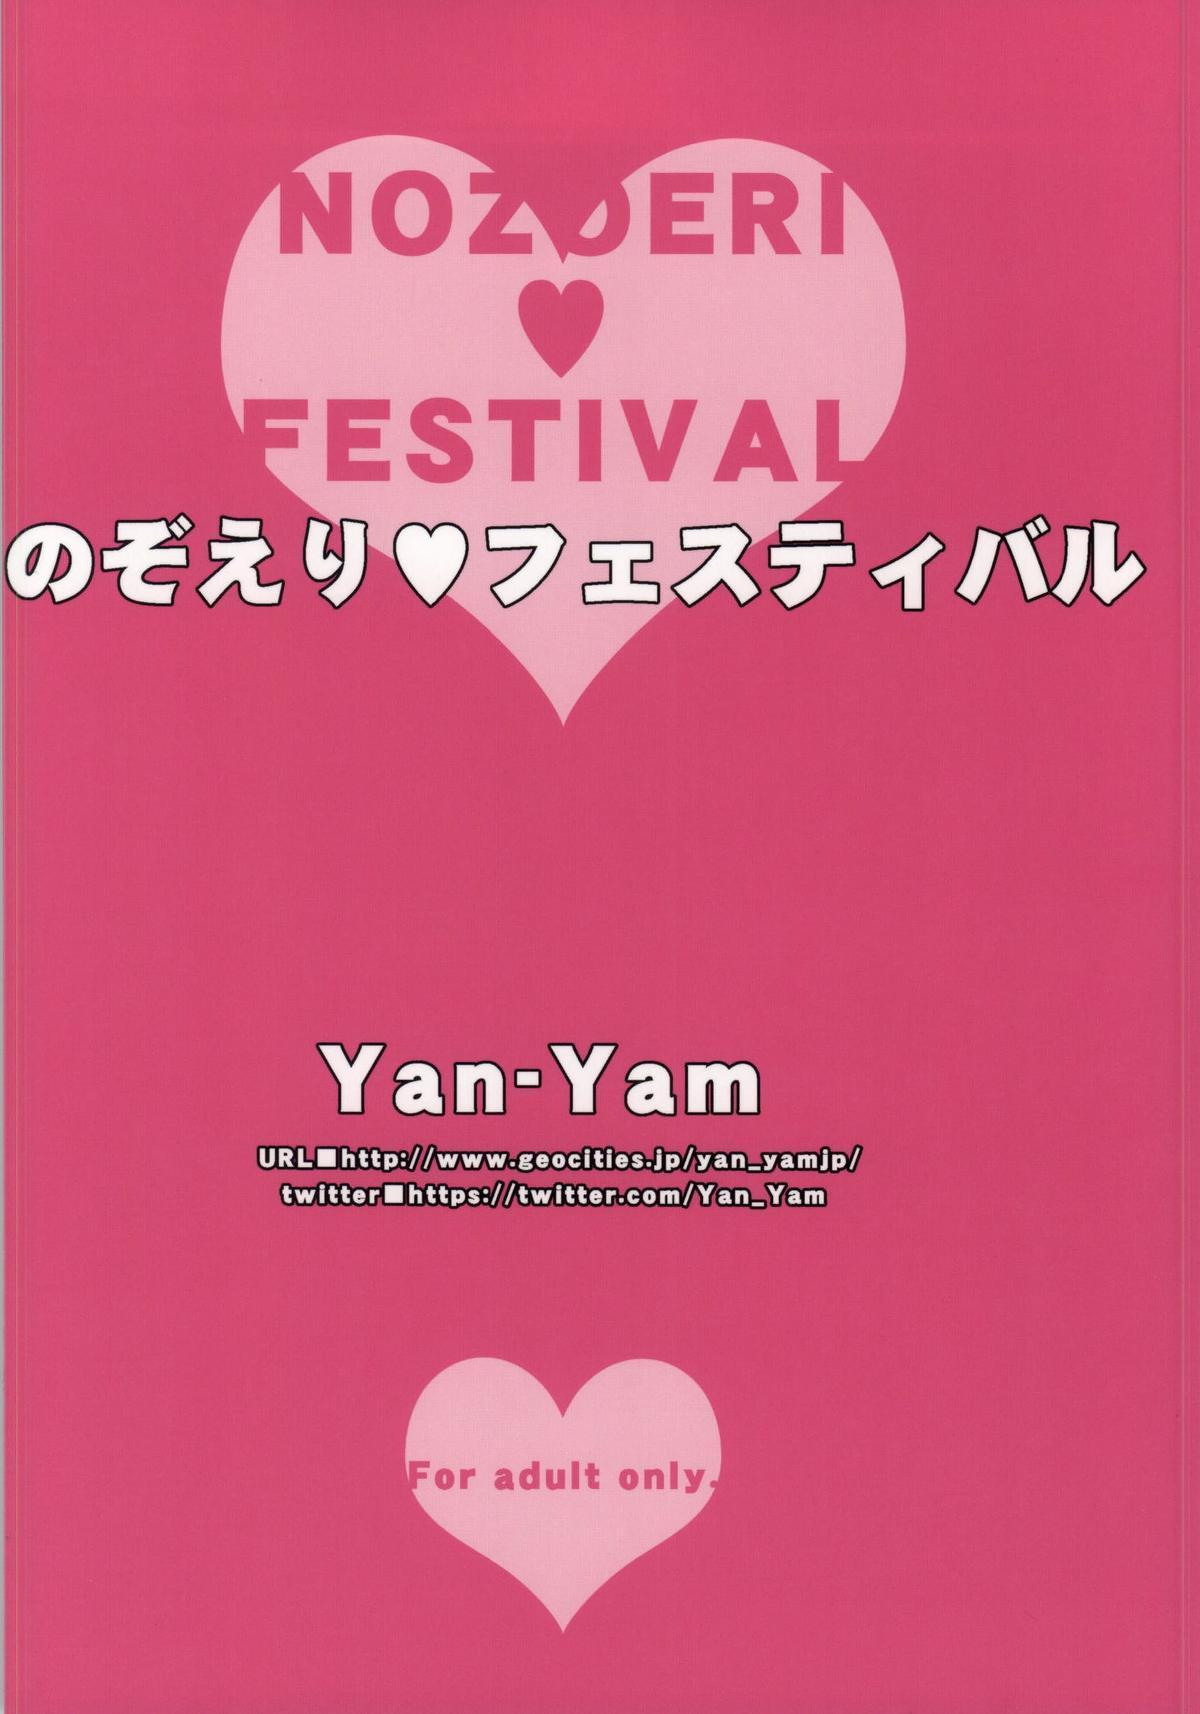 NozoEri ♥ Festival 29